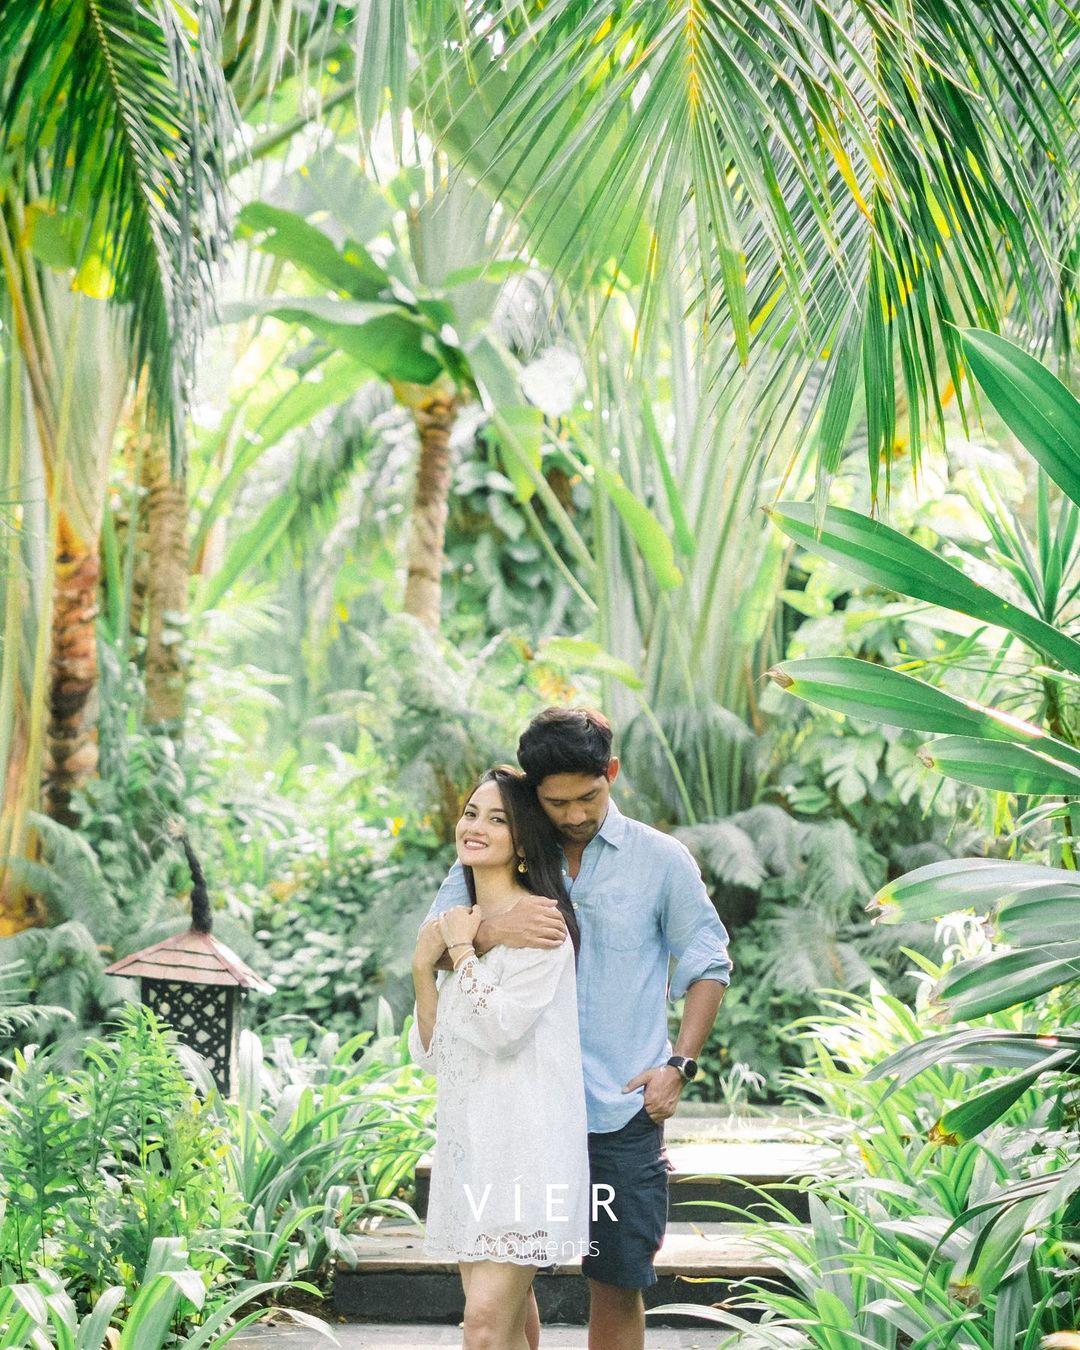 5 Potret romantis honeymoon ala Ririn Ekawati dan Ibnu Jamil di Bali